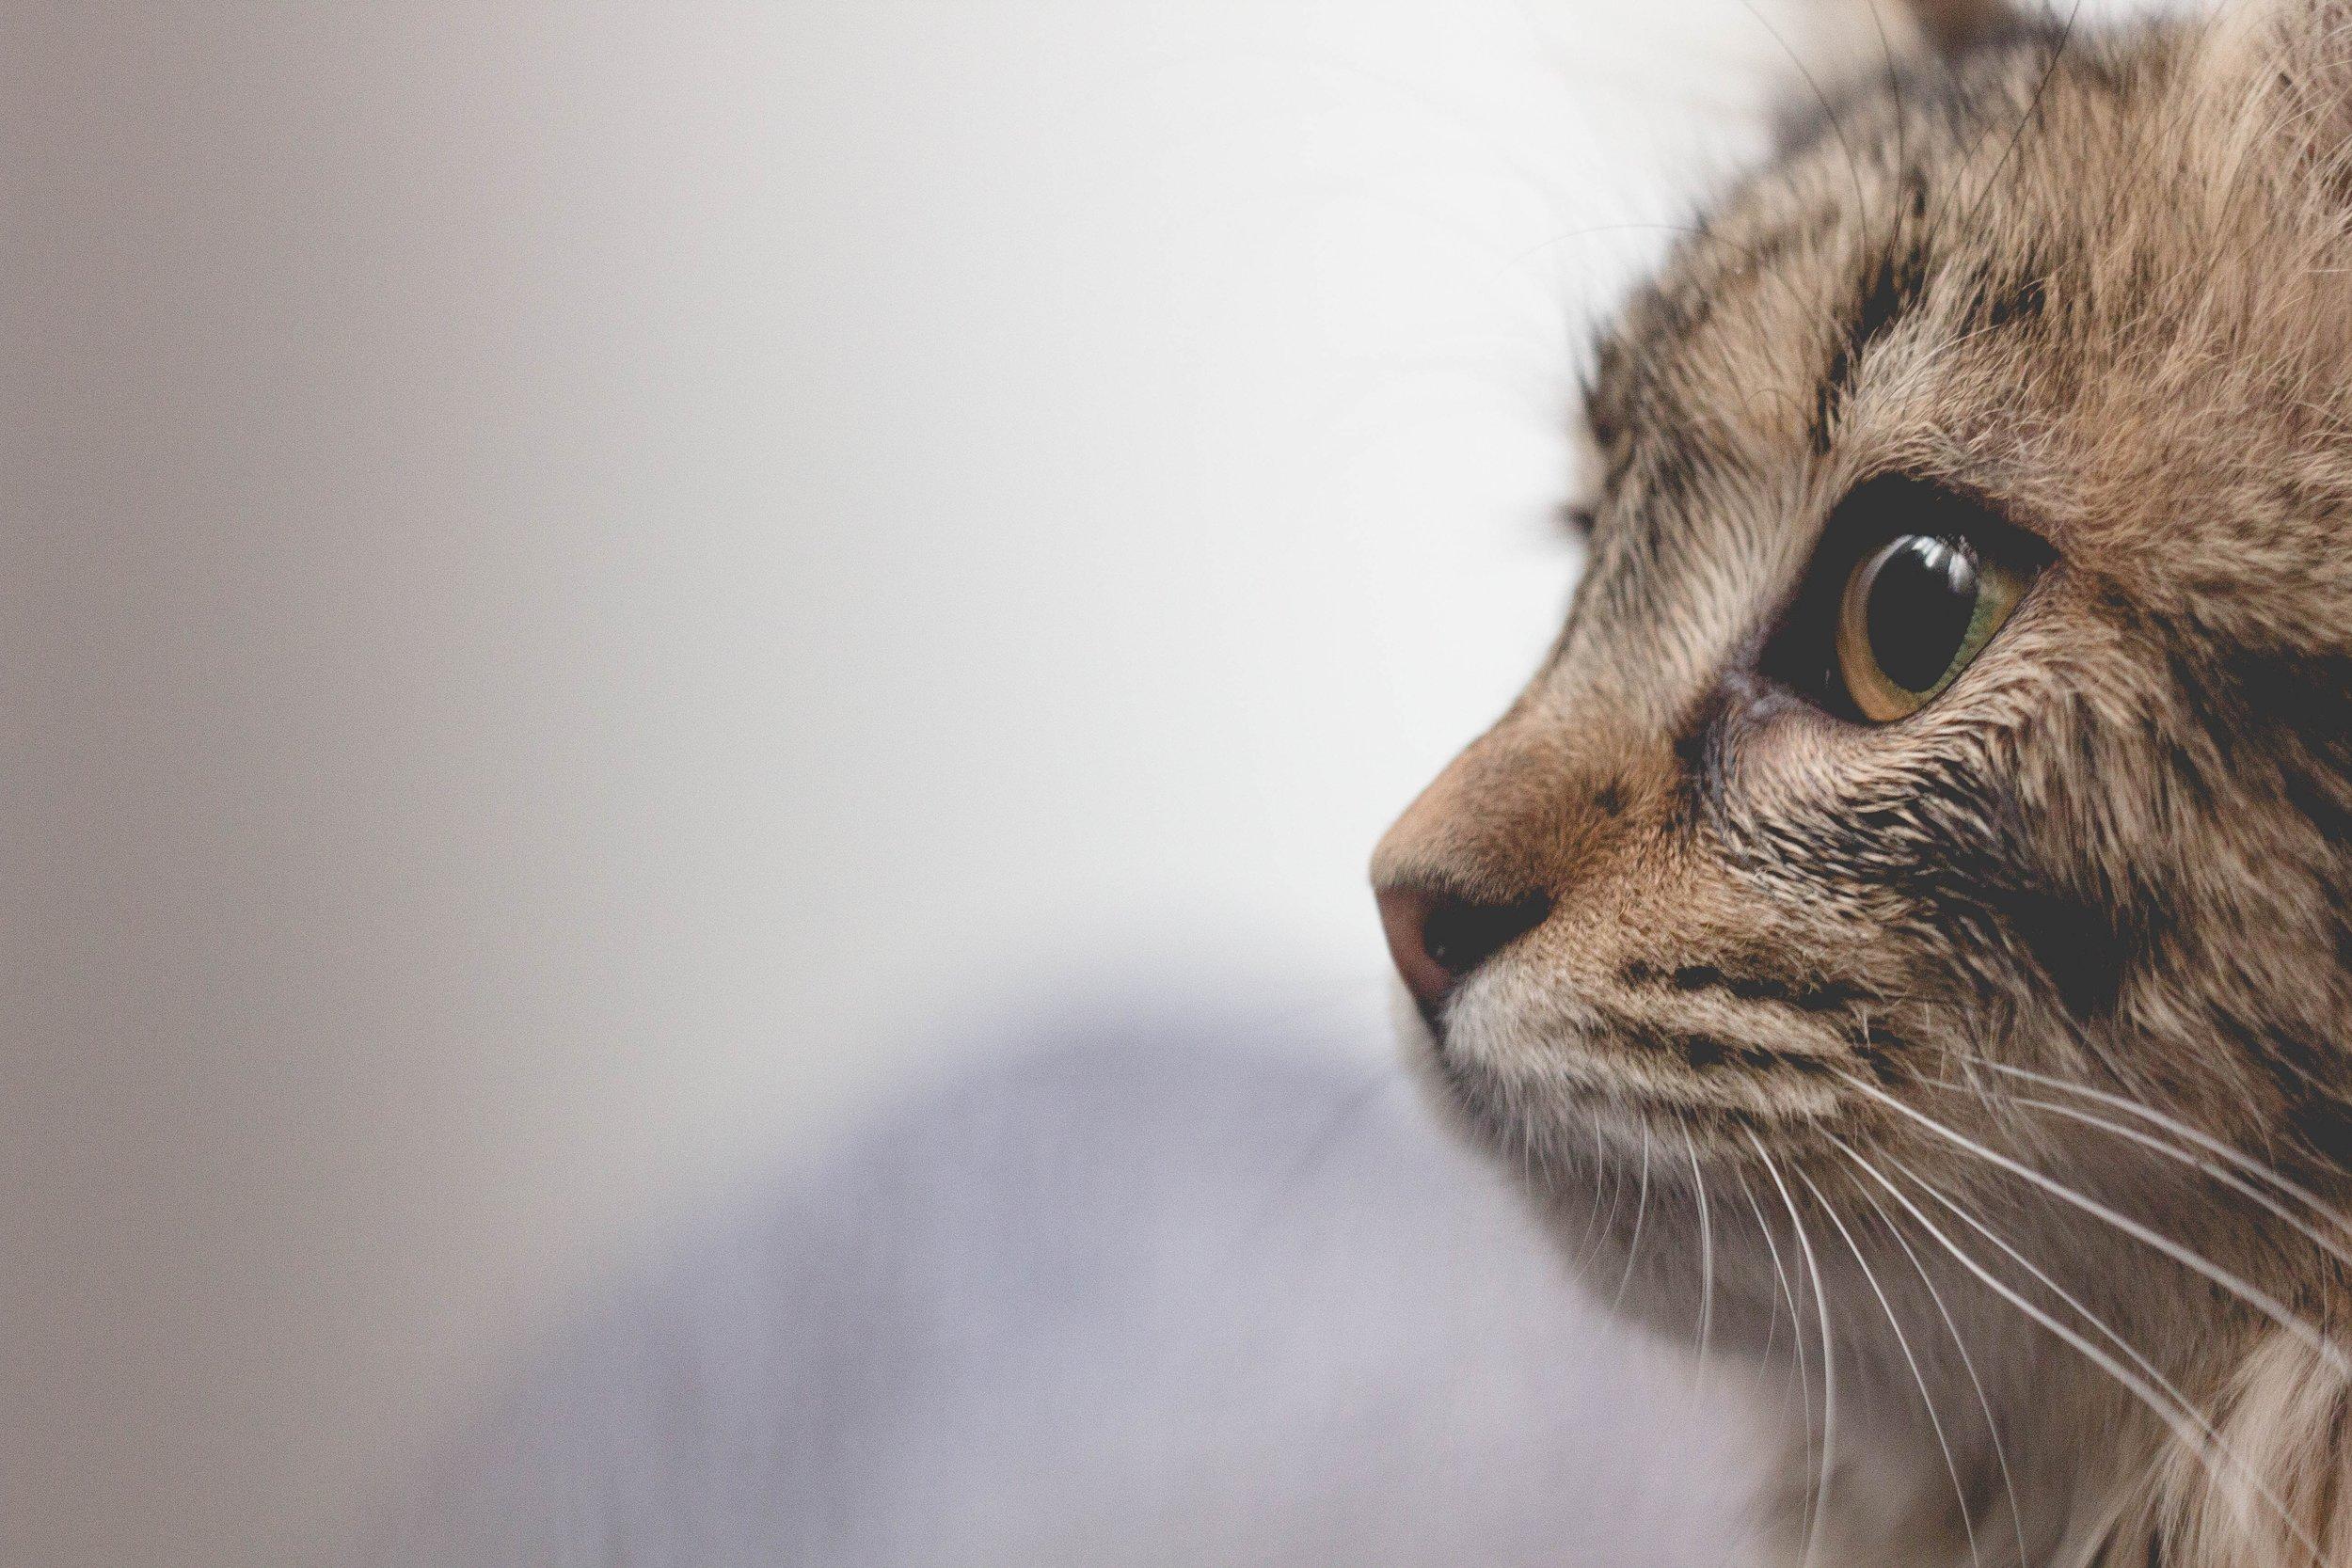 cat selfie #catbreeds #burmese #allaboutcats